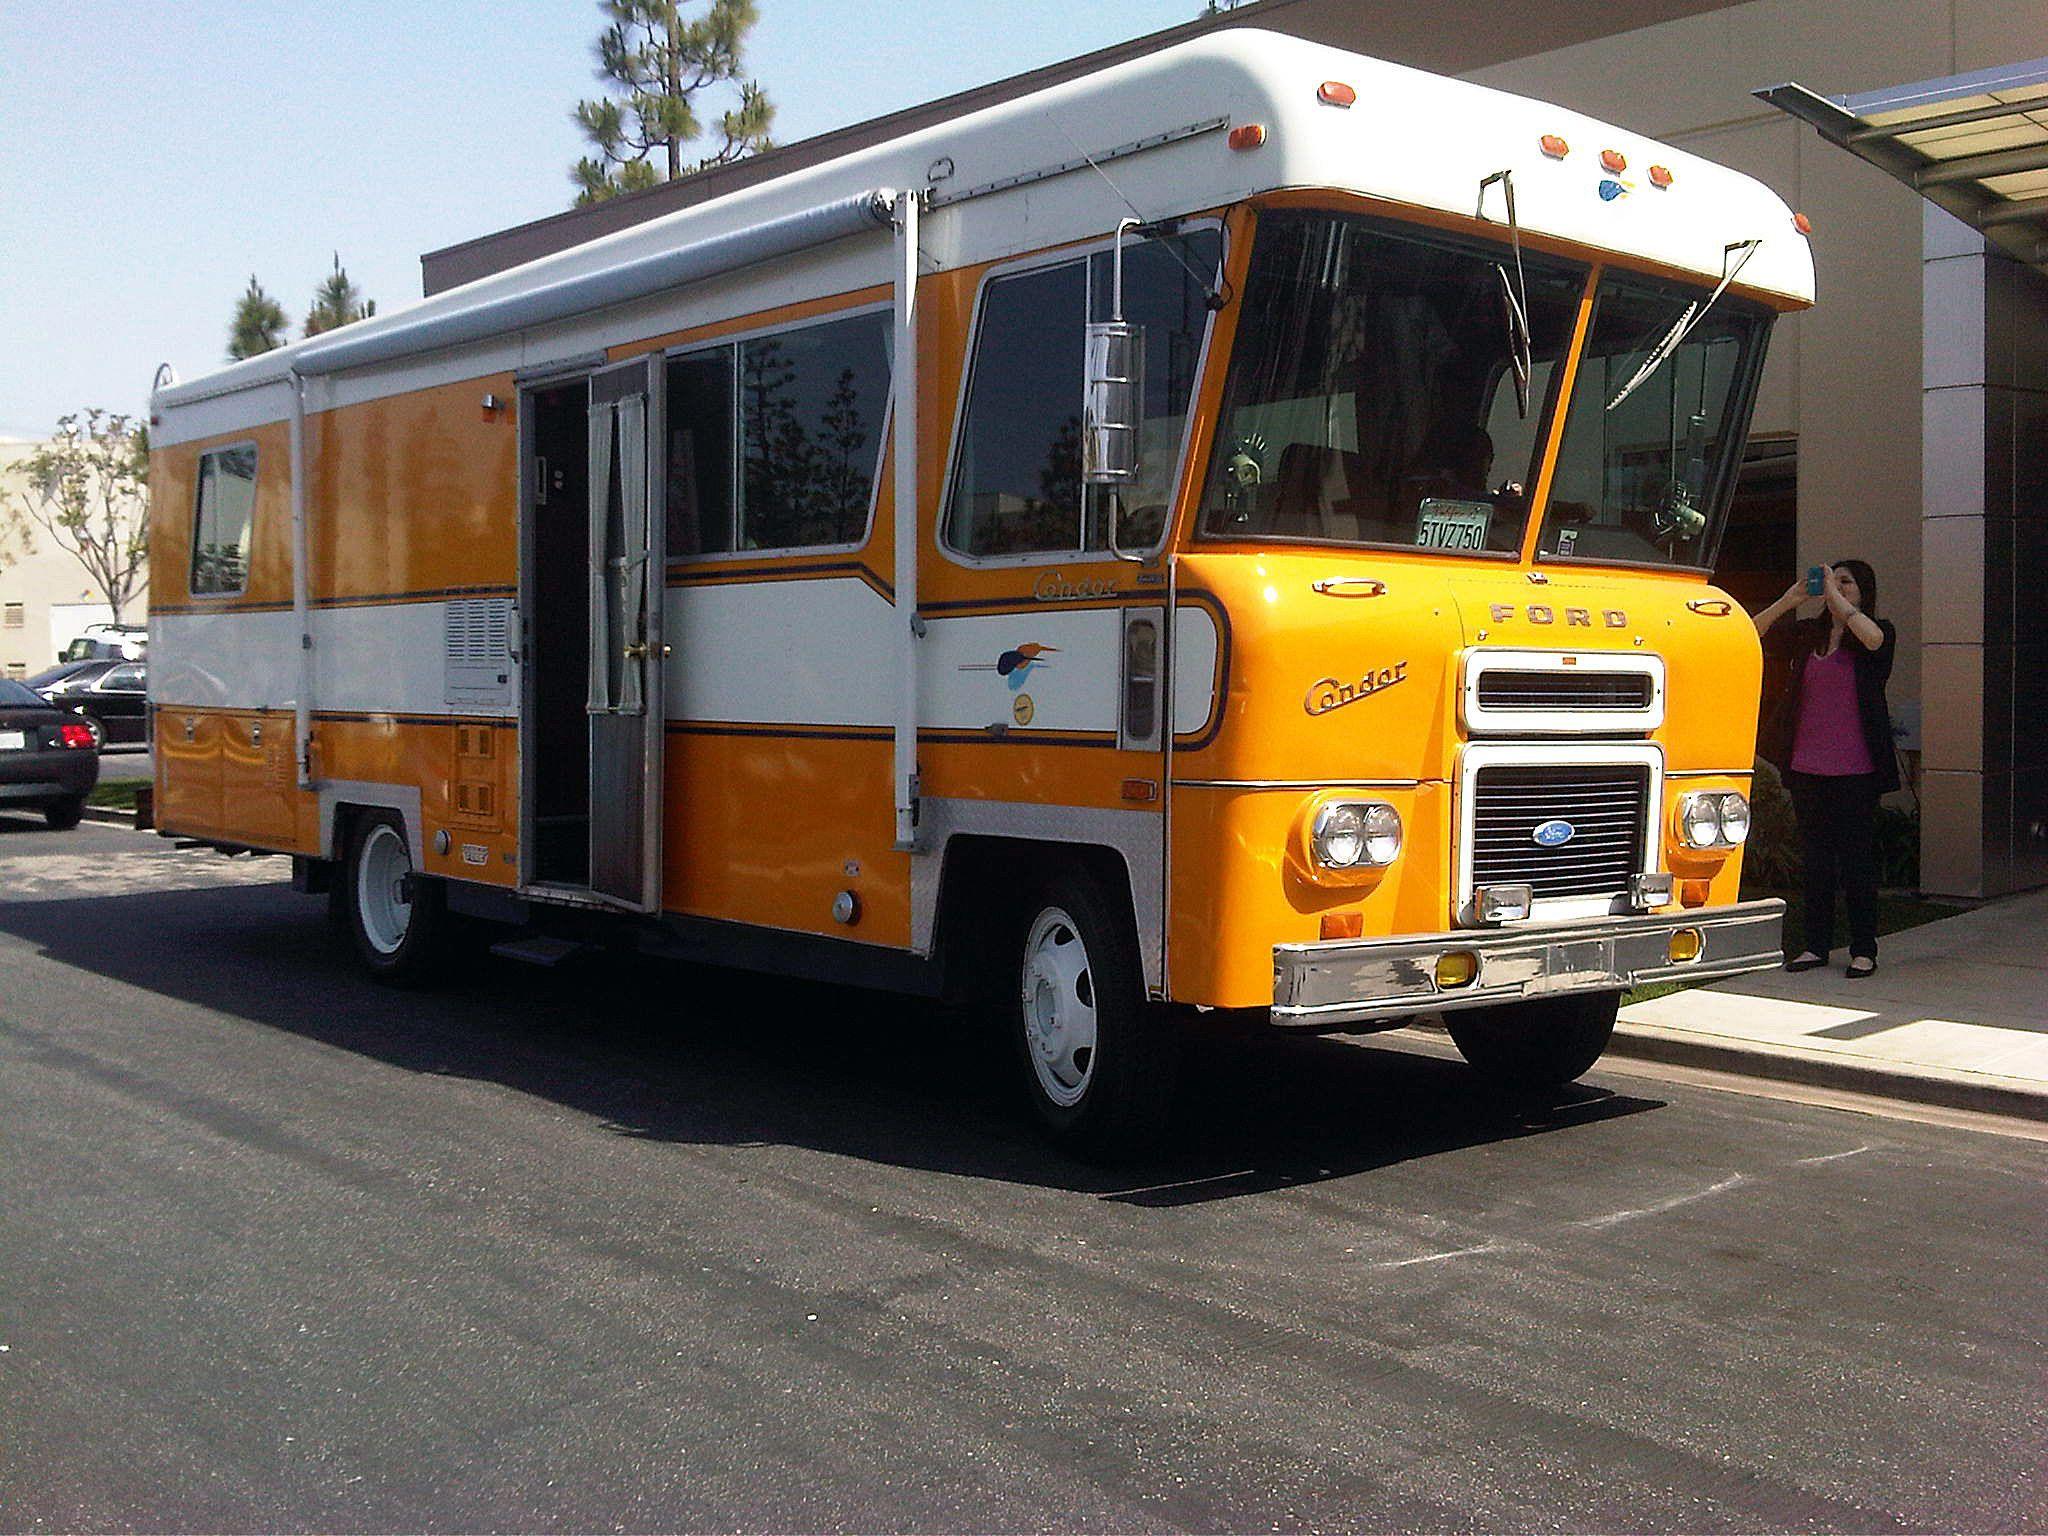 Rv Accessories Parts Supplies Rvupgrades Com Vintage Motorhome Camper Van Camper Parts